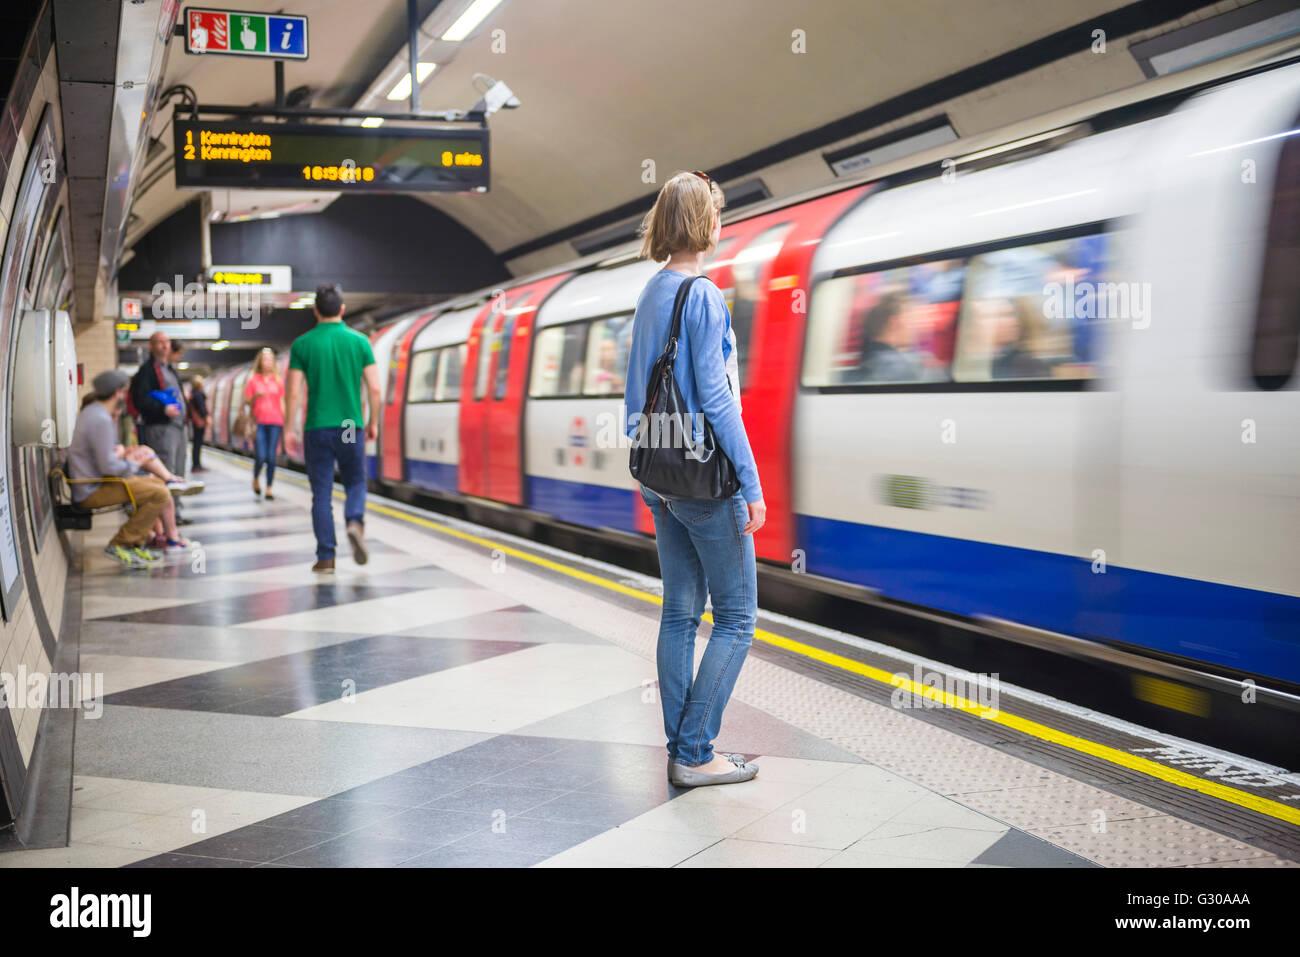 Person waiting at Waterloo underground station for the tube, London, England, United Kingdom, Europe - Stock Image